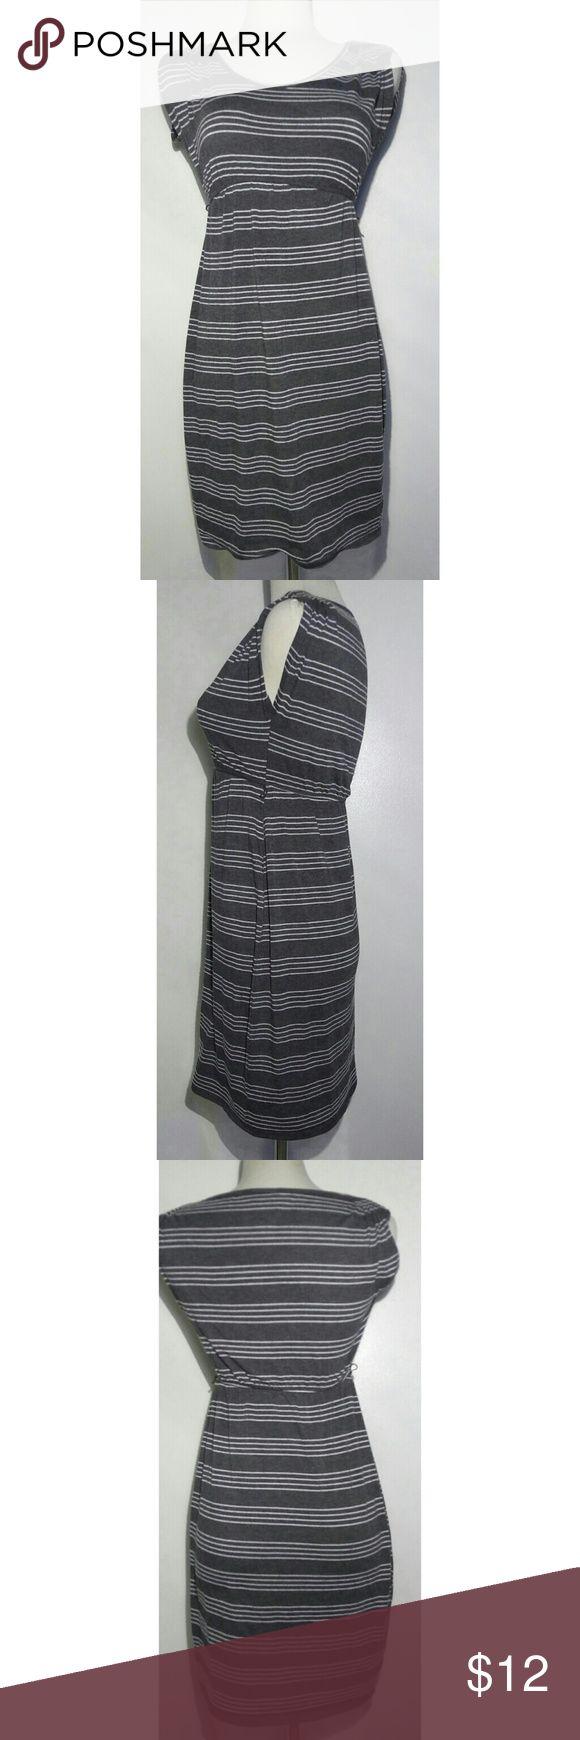 25 best grey maternity dresses ideas on pinterest maternity motherhood maternity dress ombrellifo Choice Image